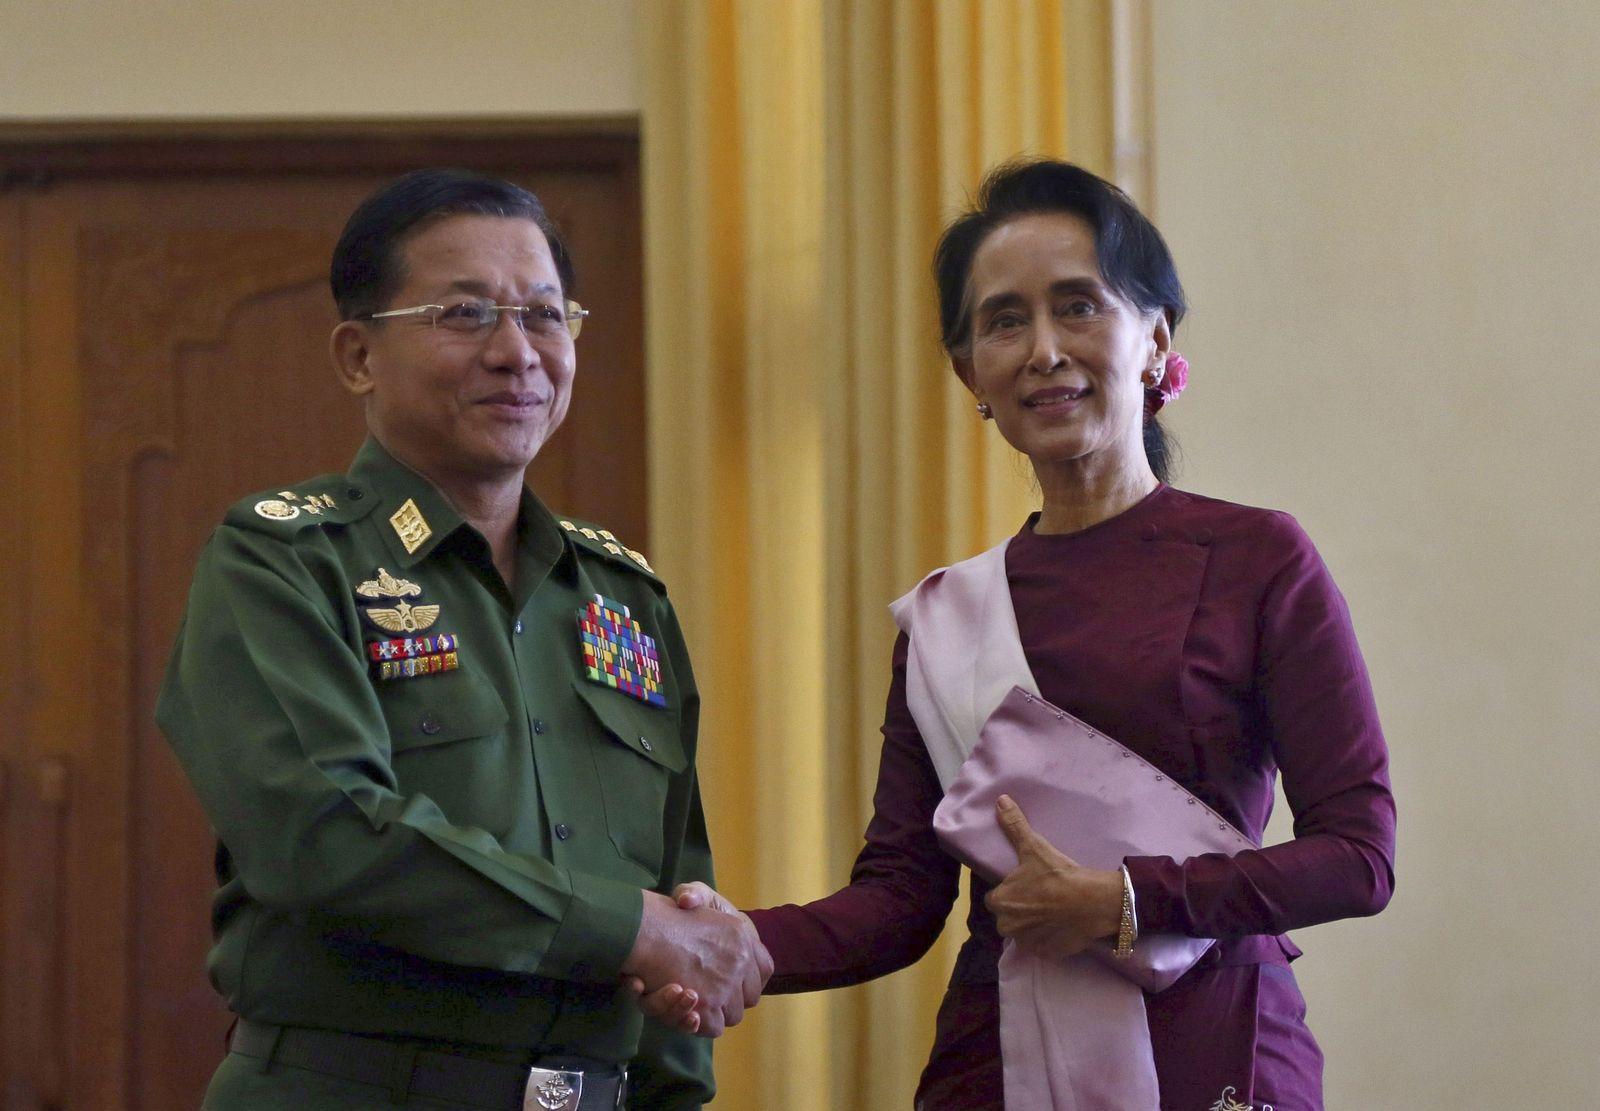 Min Aung Hlaing/ Aung San Suu Kyi/ Myanmar